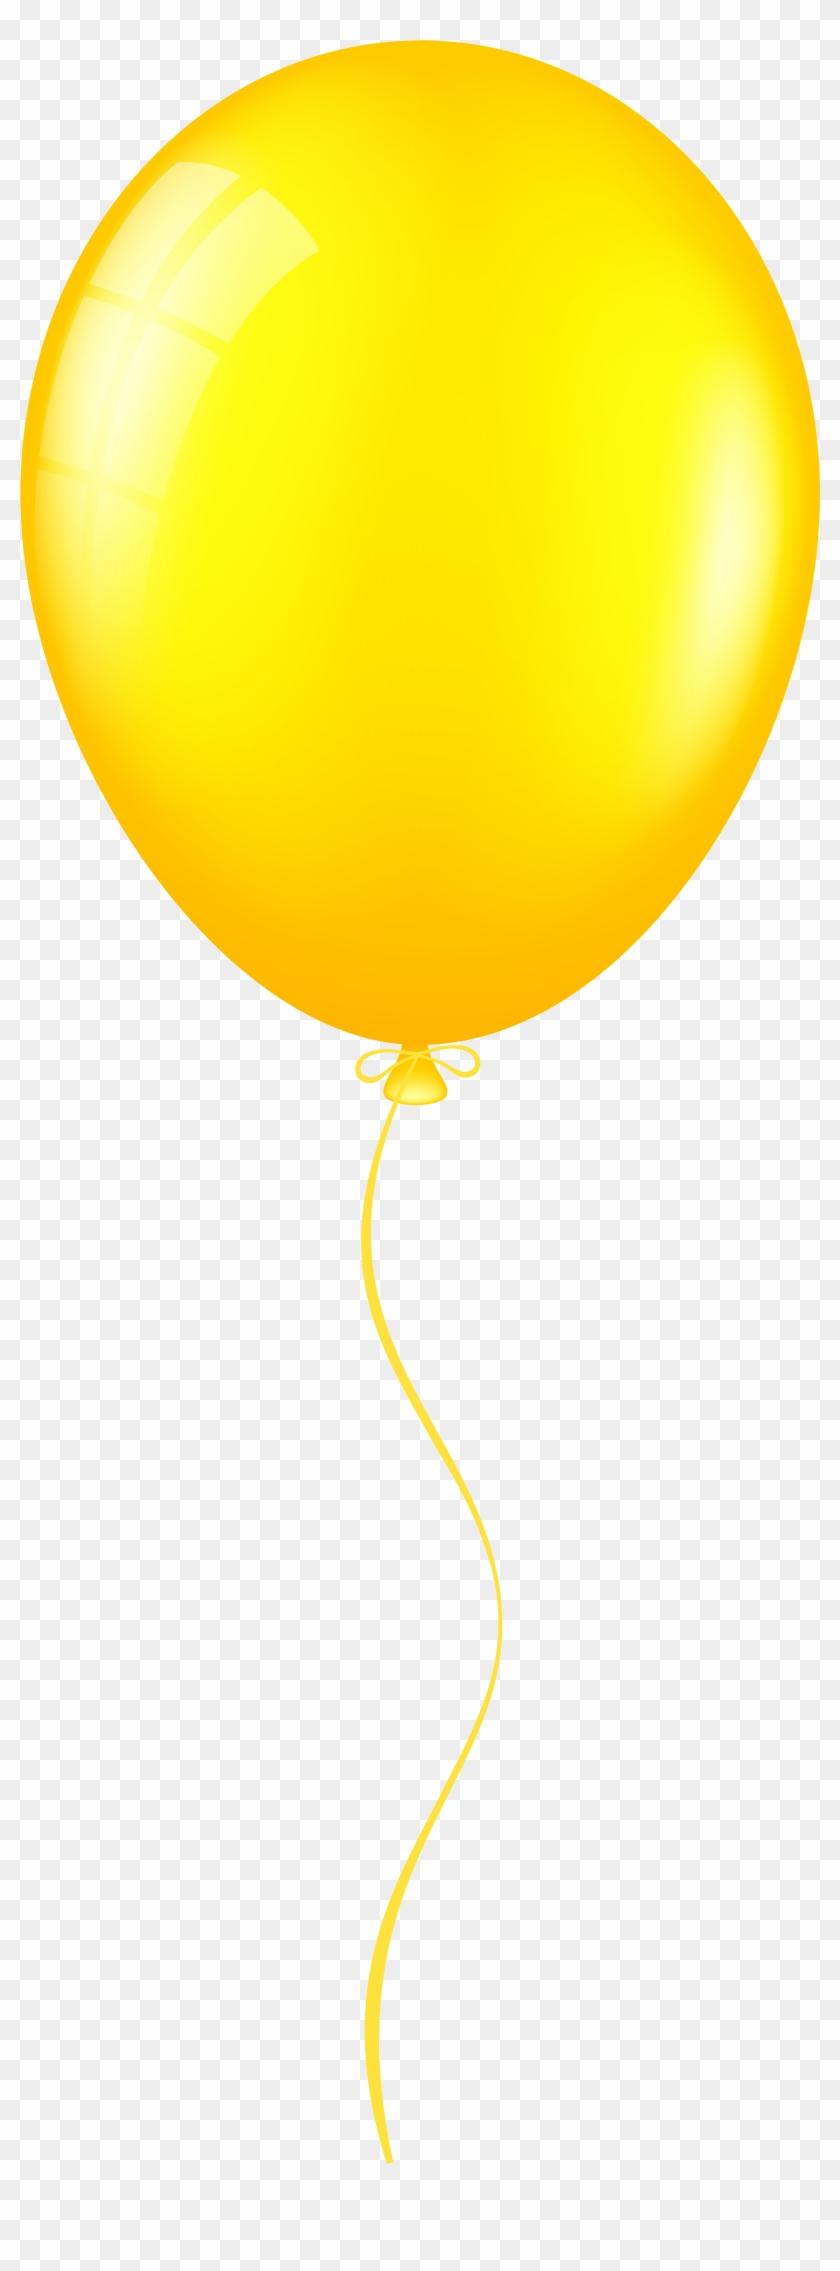 Yellow Balloon Png Clip Art - Balloon #99039